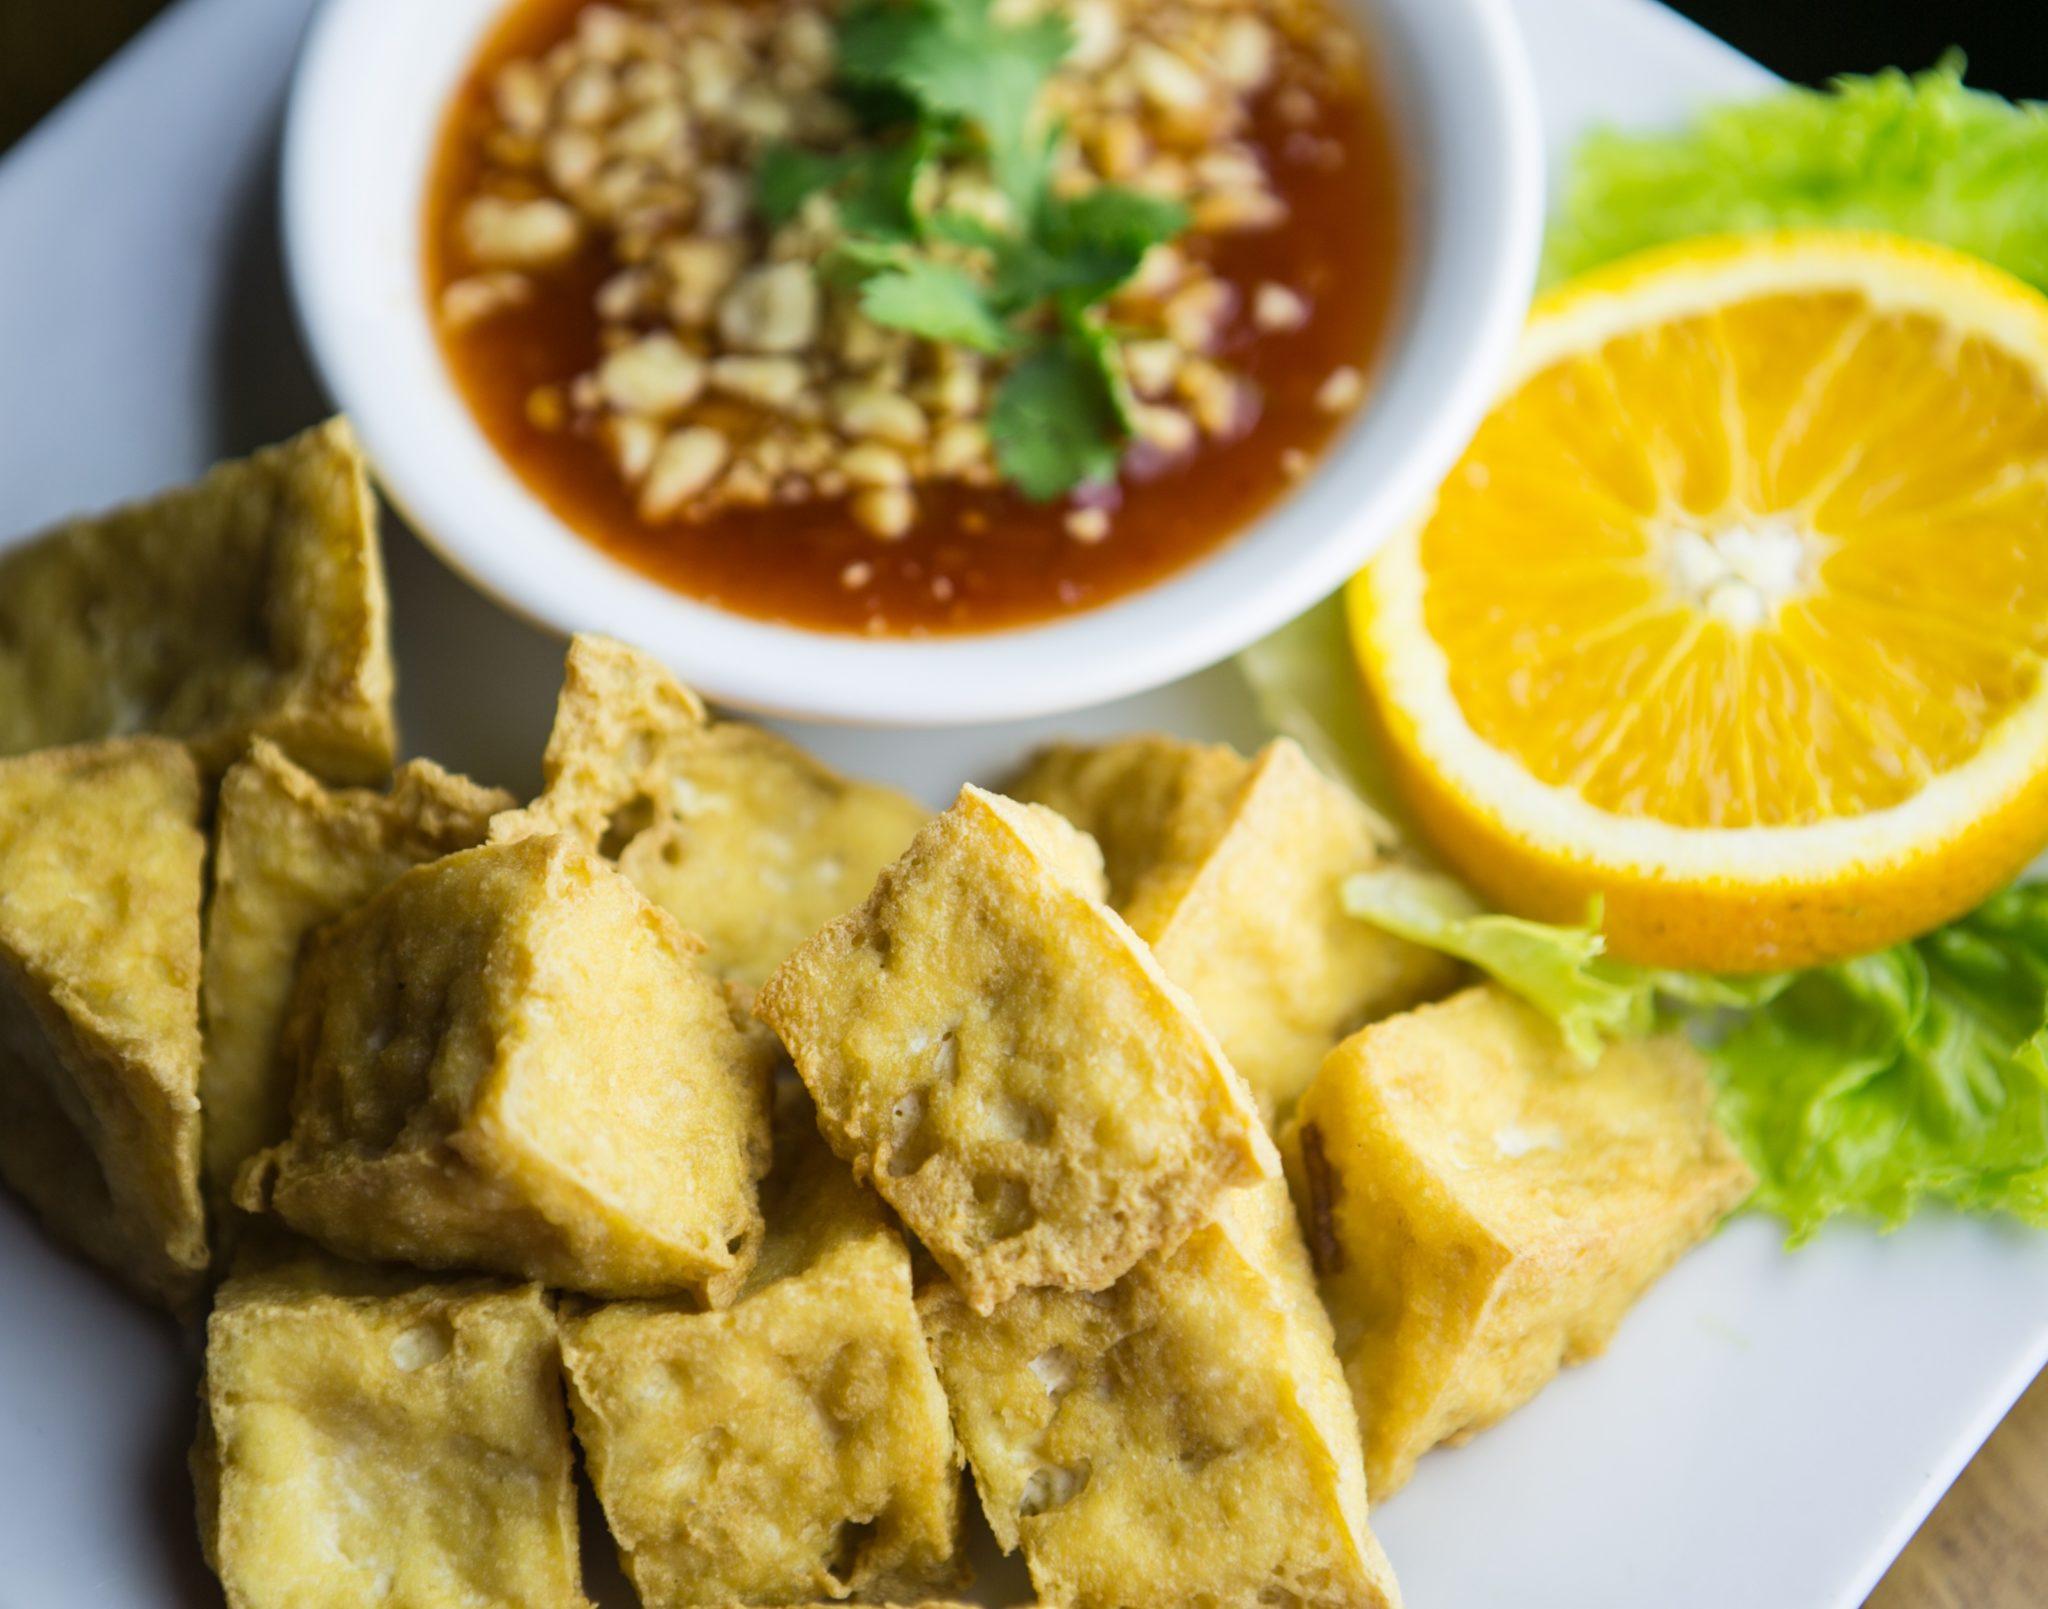 Vegan Thai dishes